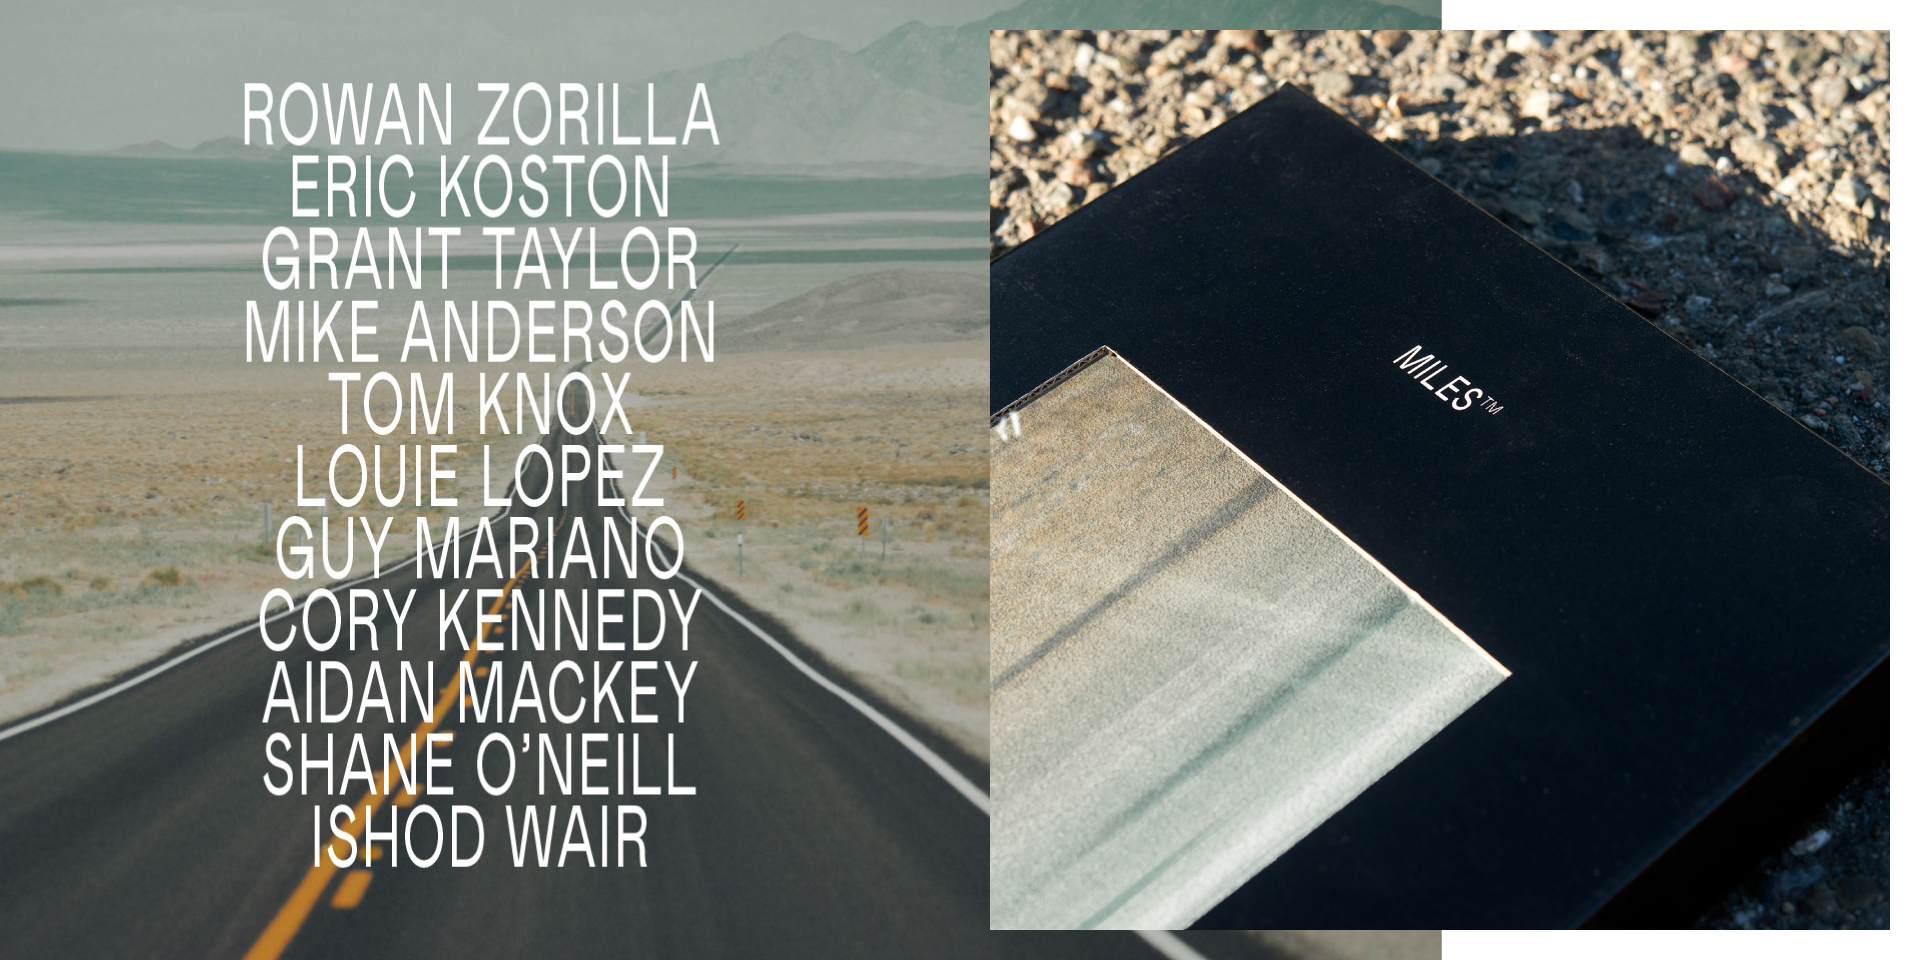 Rowan Zorilla, Eric Koston, Grant Taylor, Mike Anderson, Tom Knox, Louie Lopez, Guy Mariano, Cory Kennedy, Aidan Mackey, Shane O'Neill, Ishod Wair. Miles Griptape